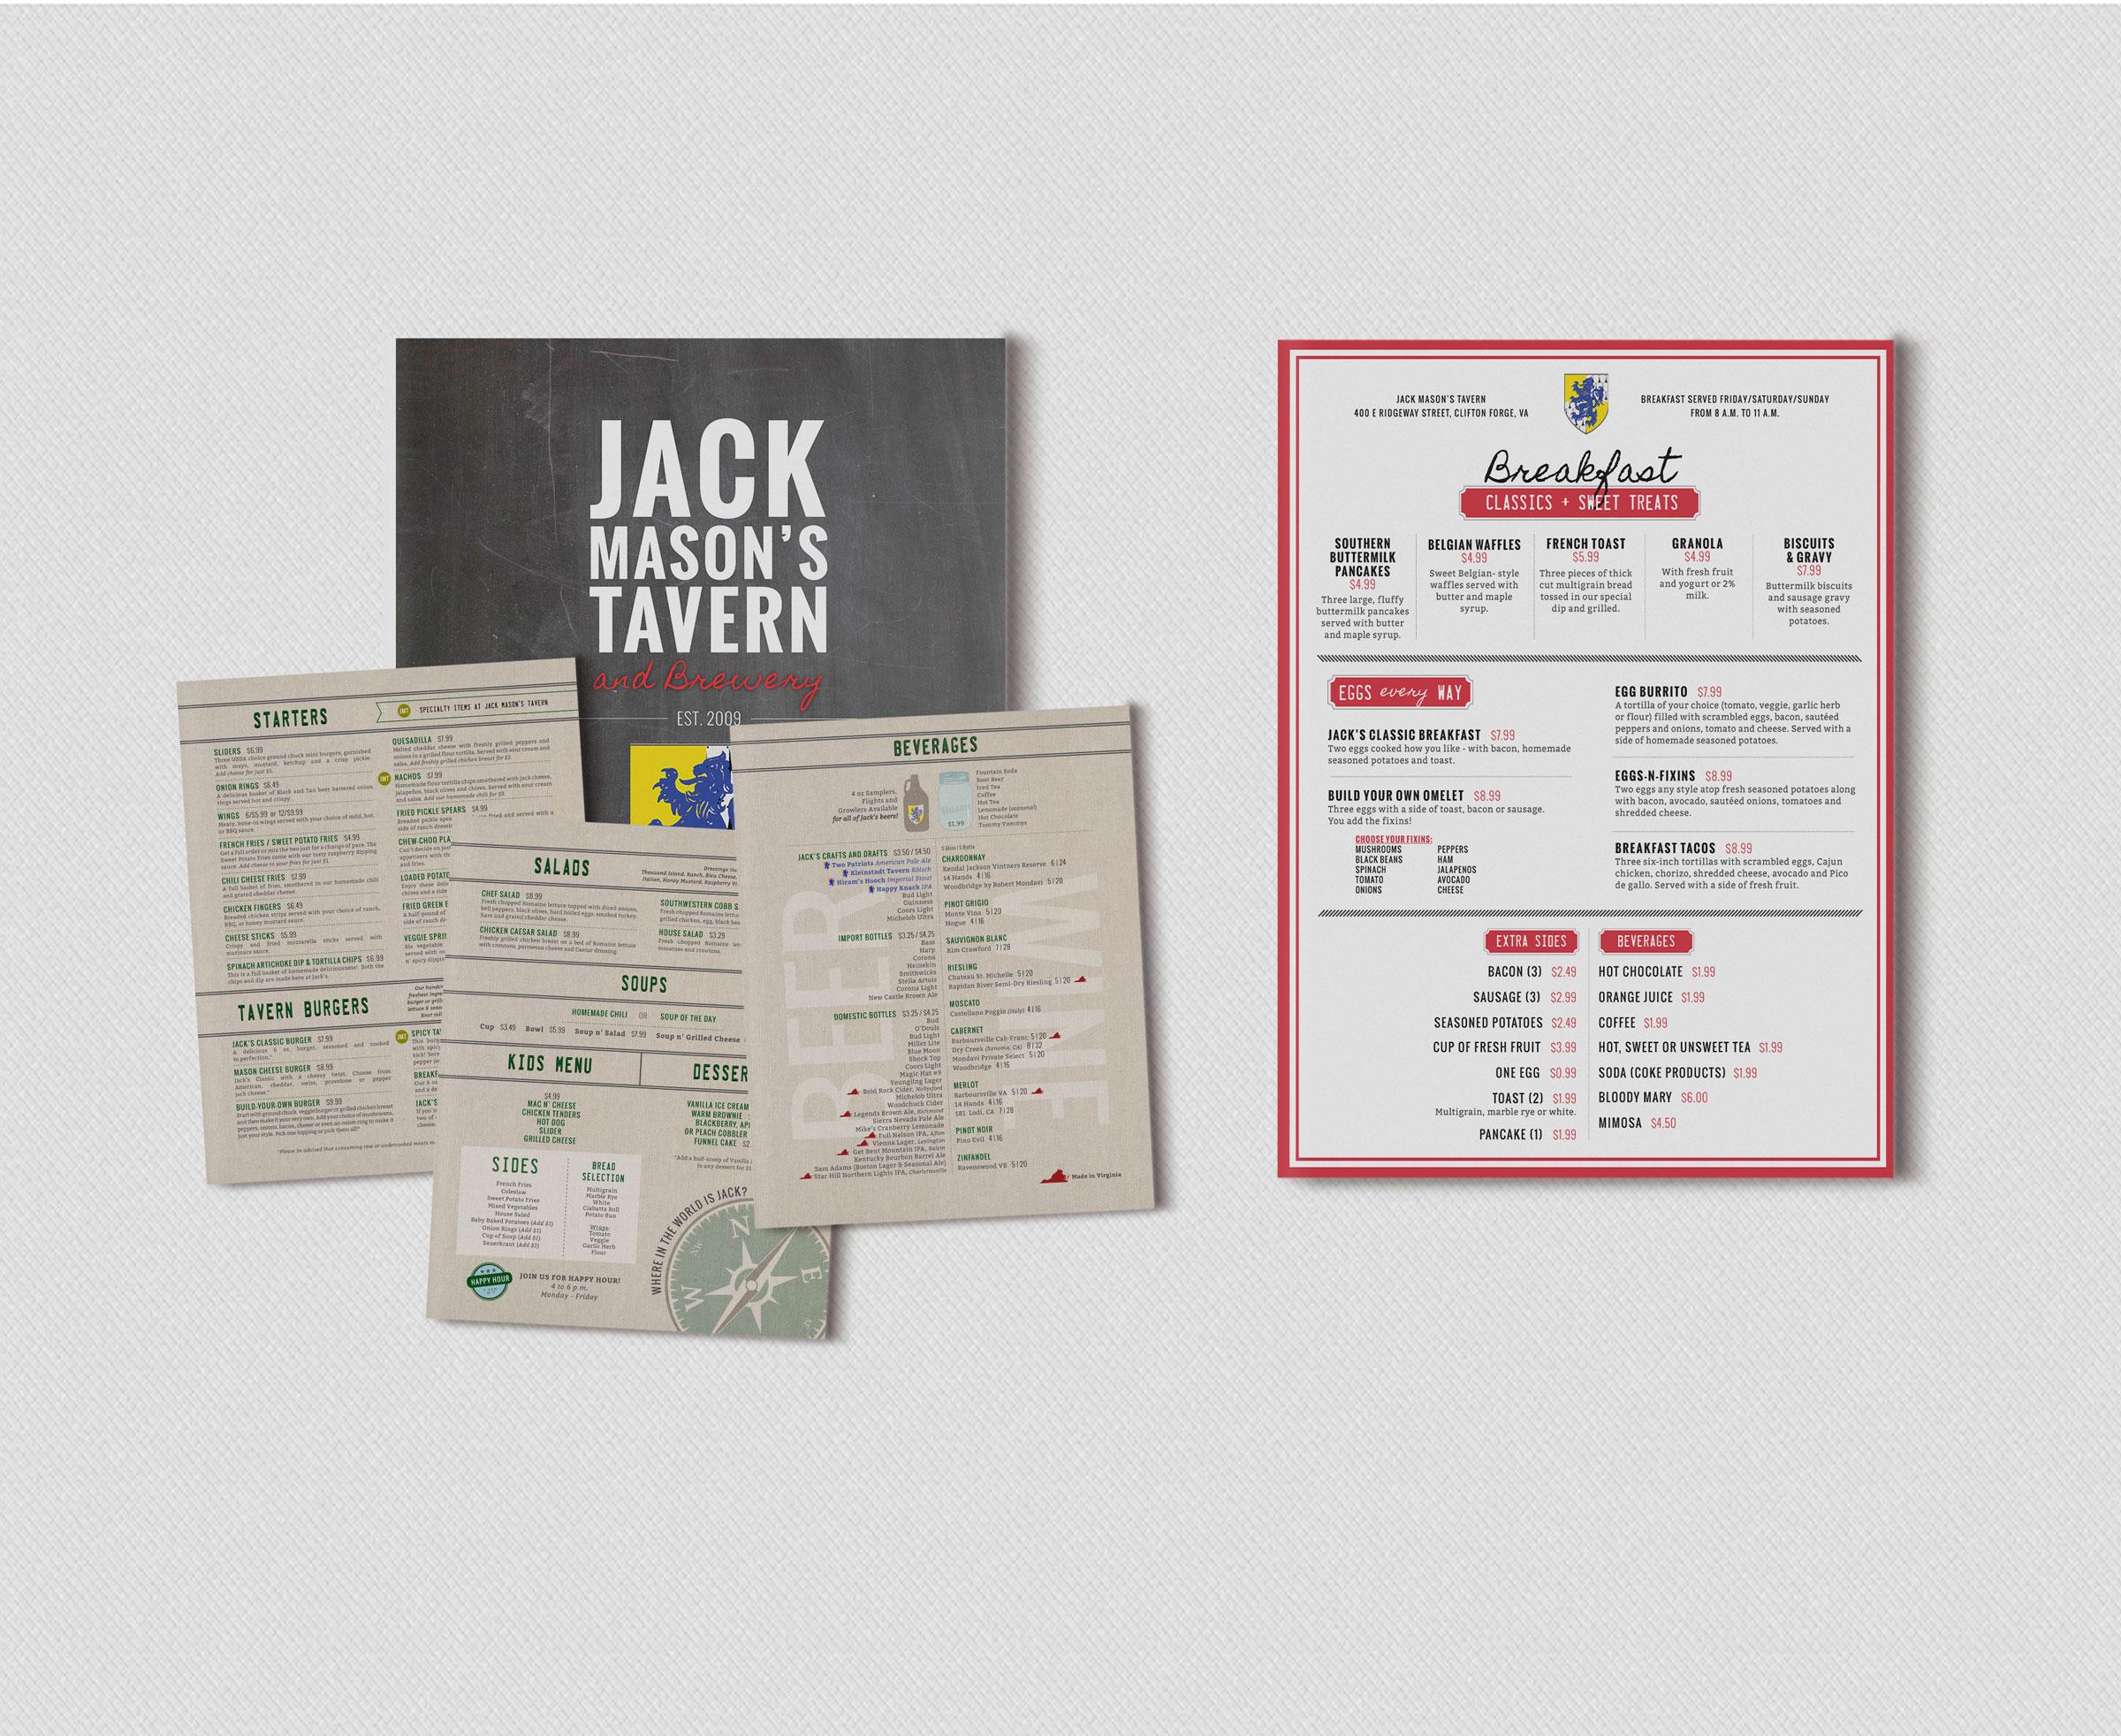 Jack Mason's Tavern -